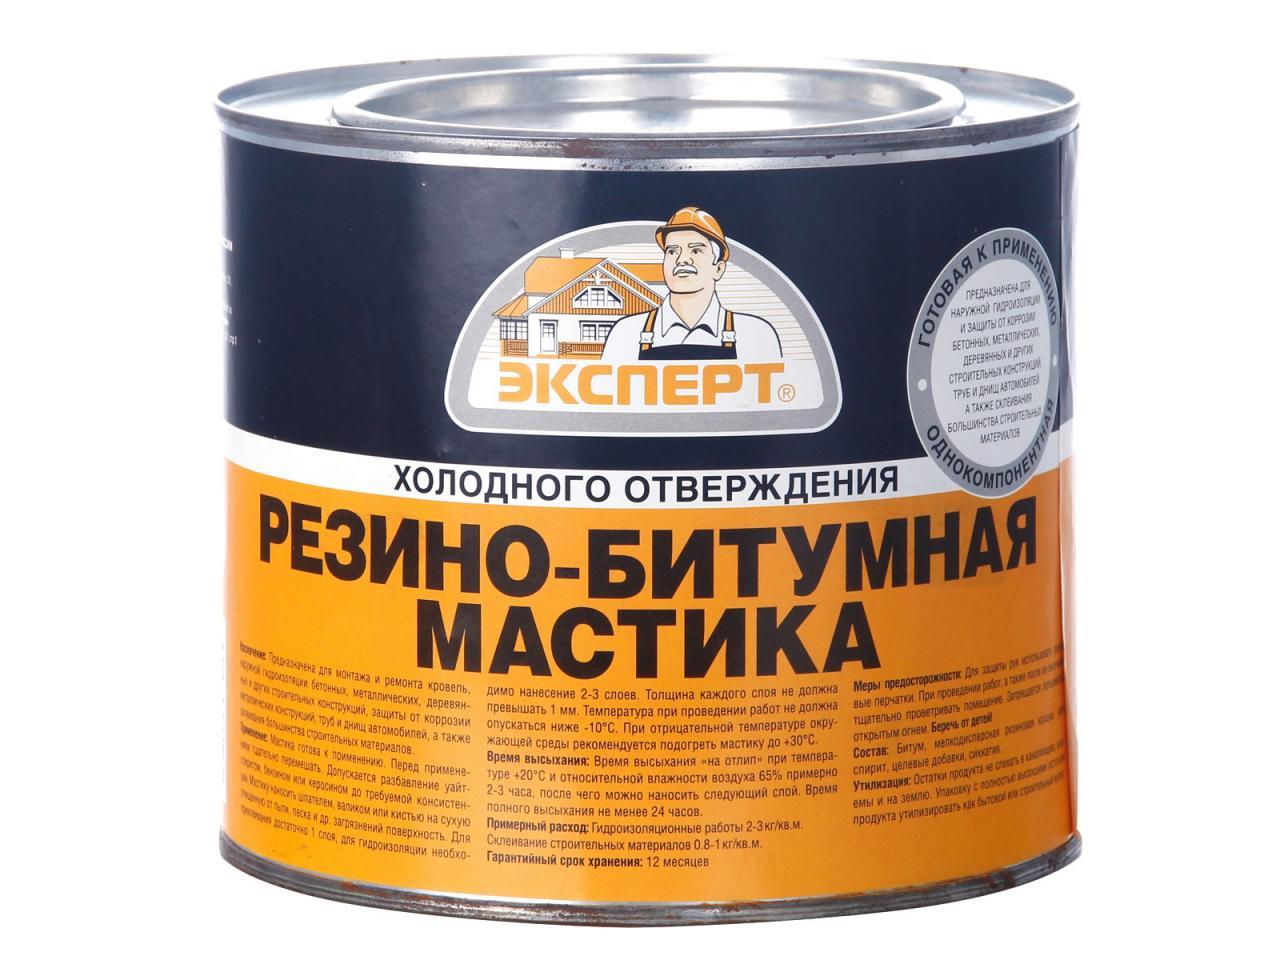 Мастика резино-битумная ЭКСПЕРТ, 2л1,8кг